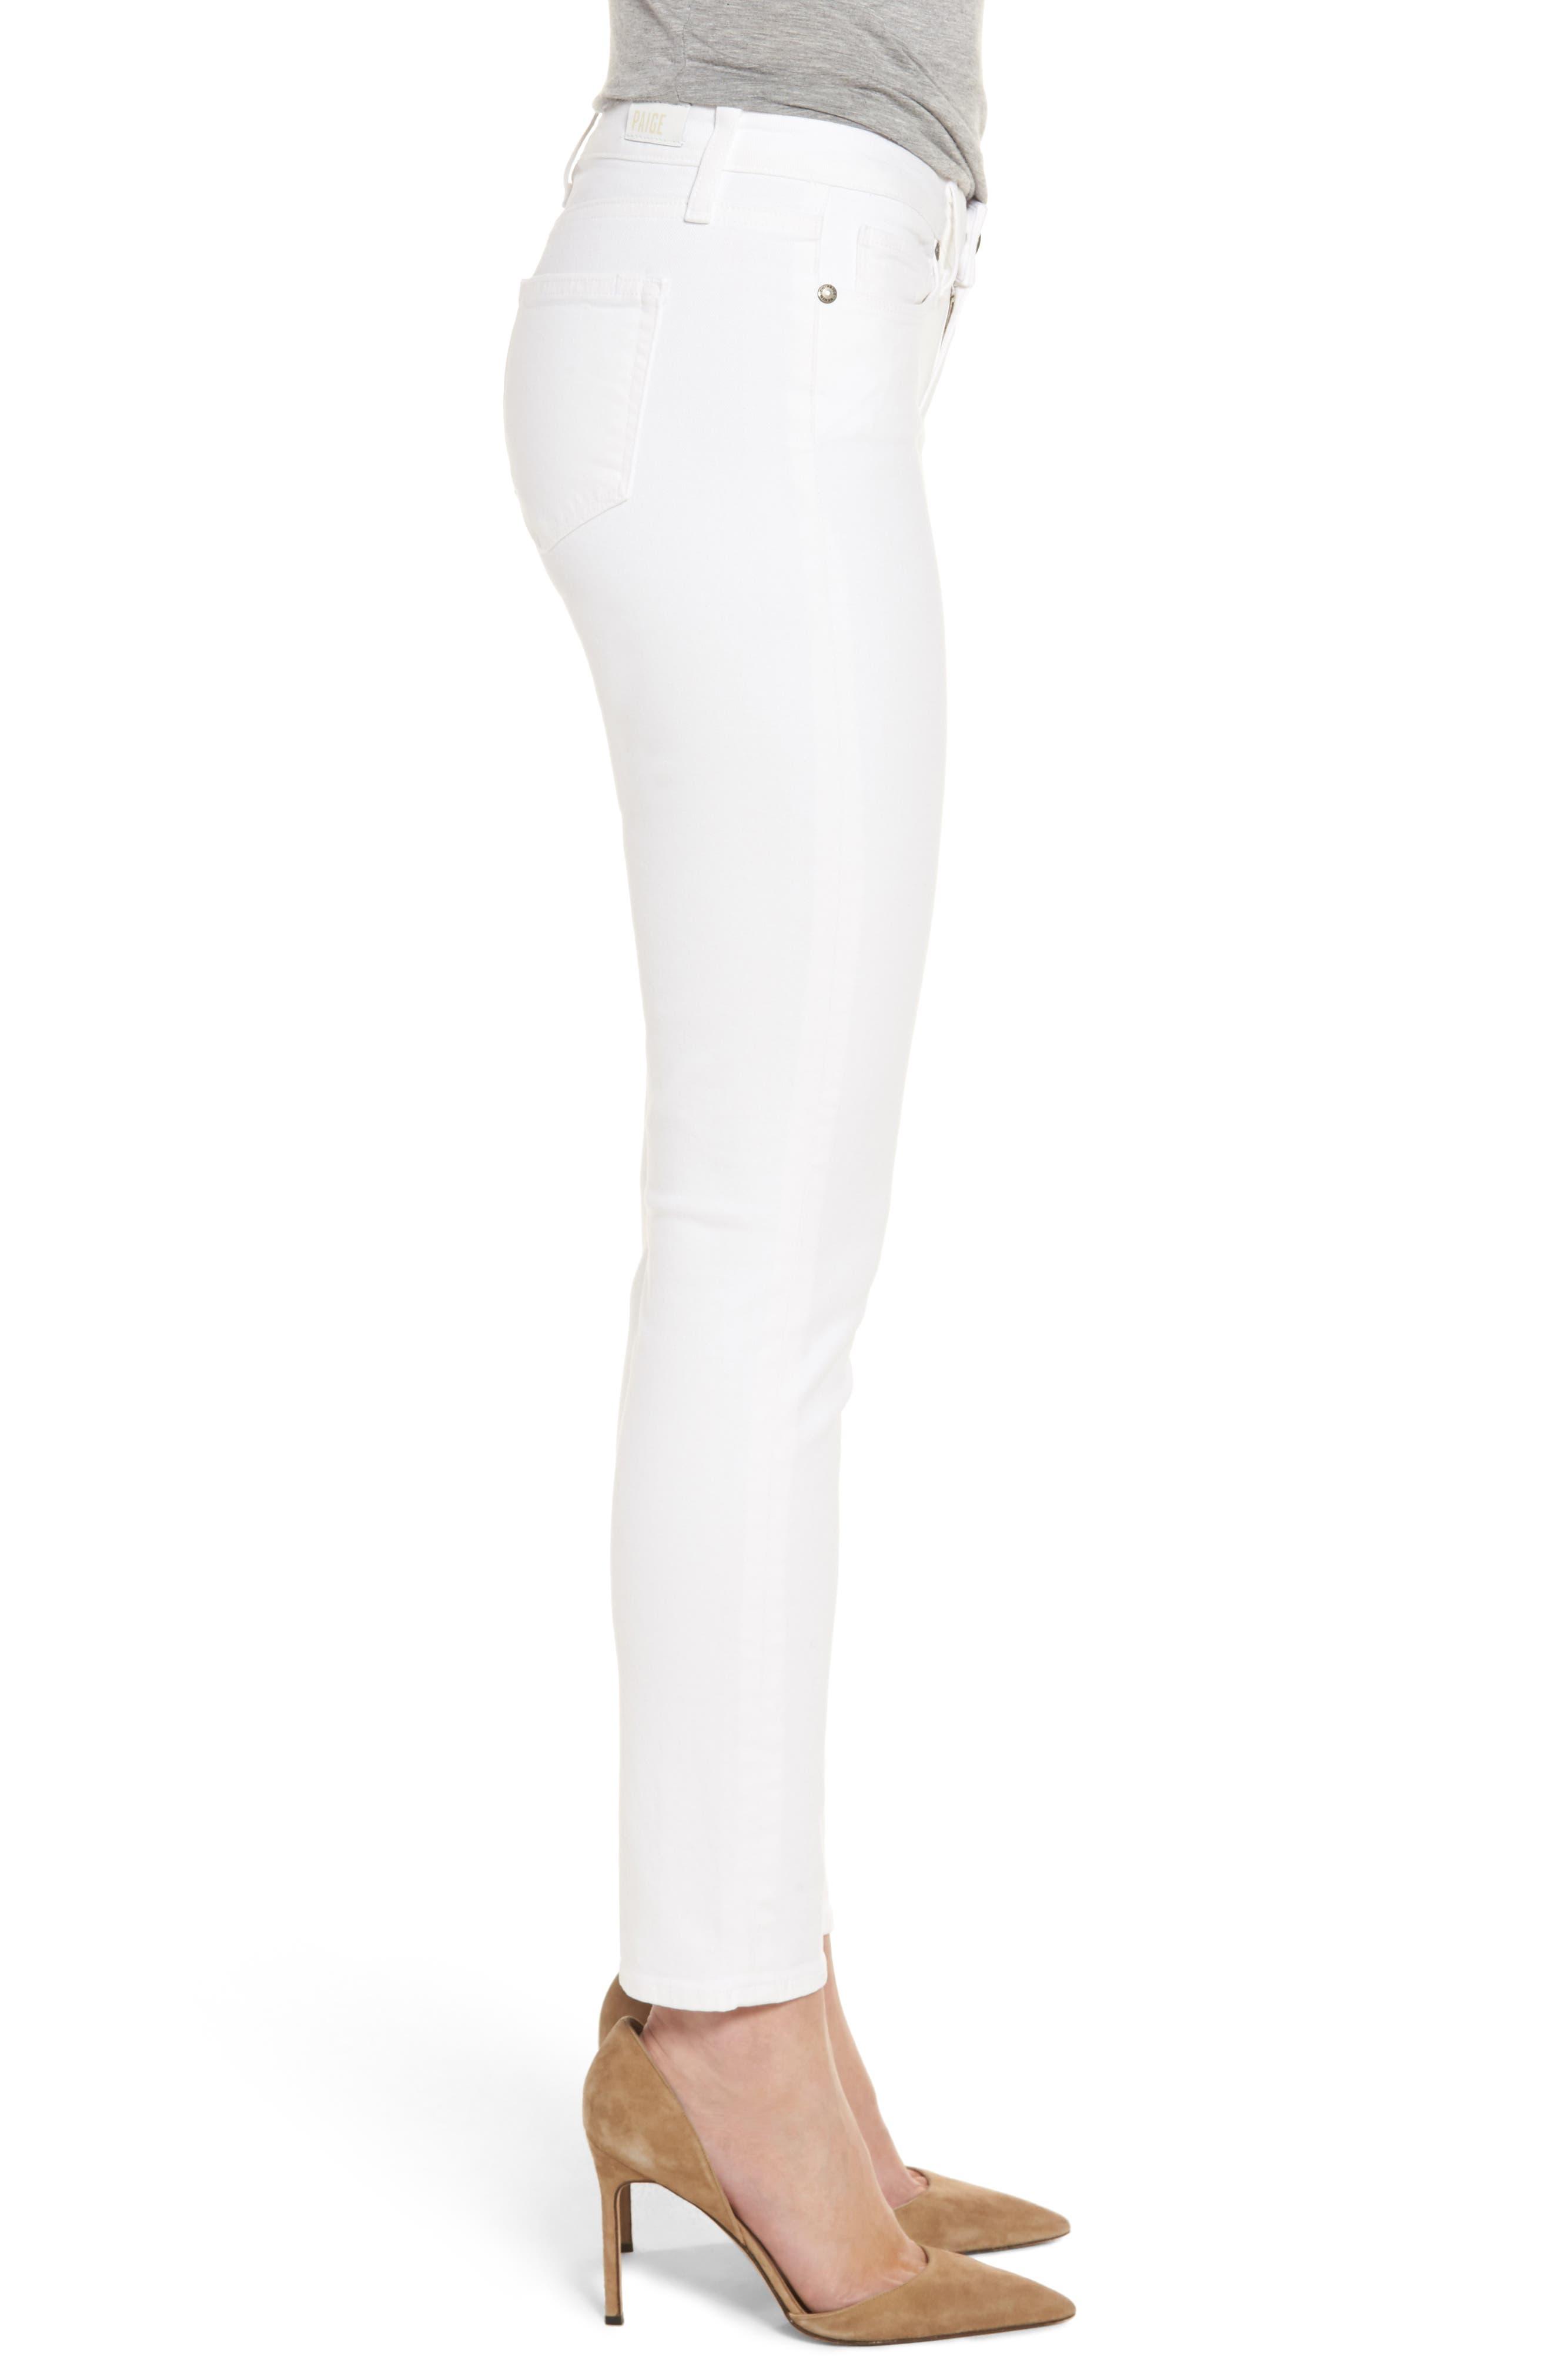 PAIGE, 'Skyline' Ankle Peg Skinny Jeans, Alternate thumbnail 4, color, 100